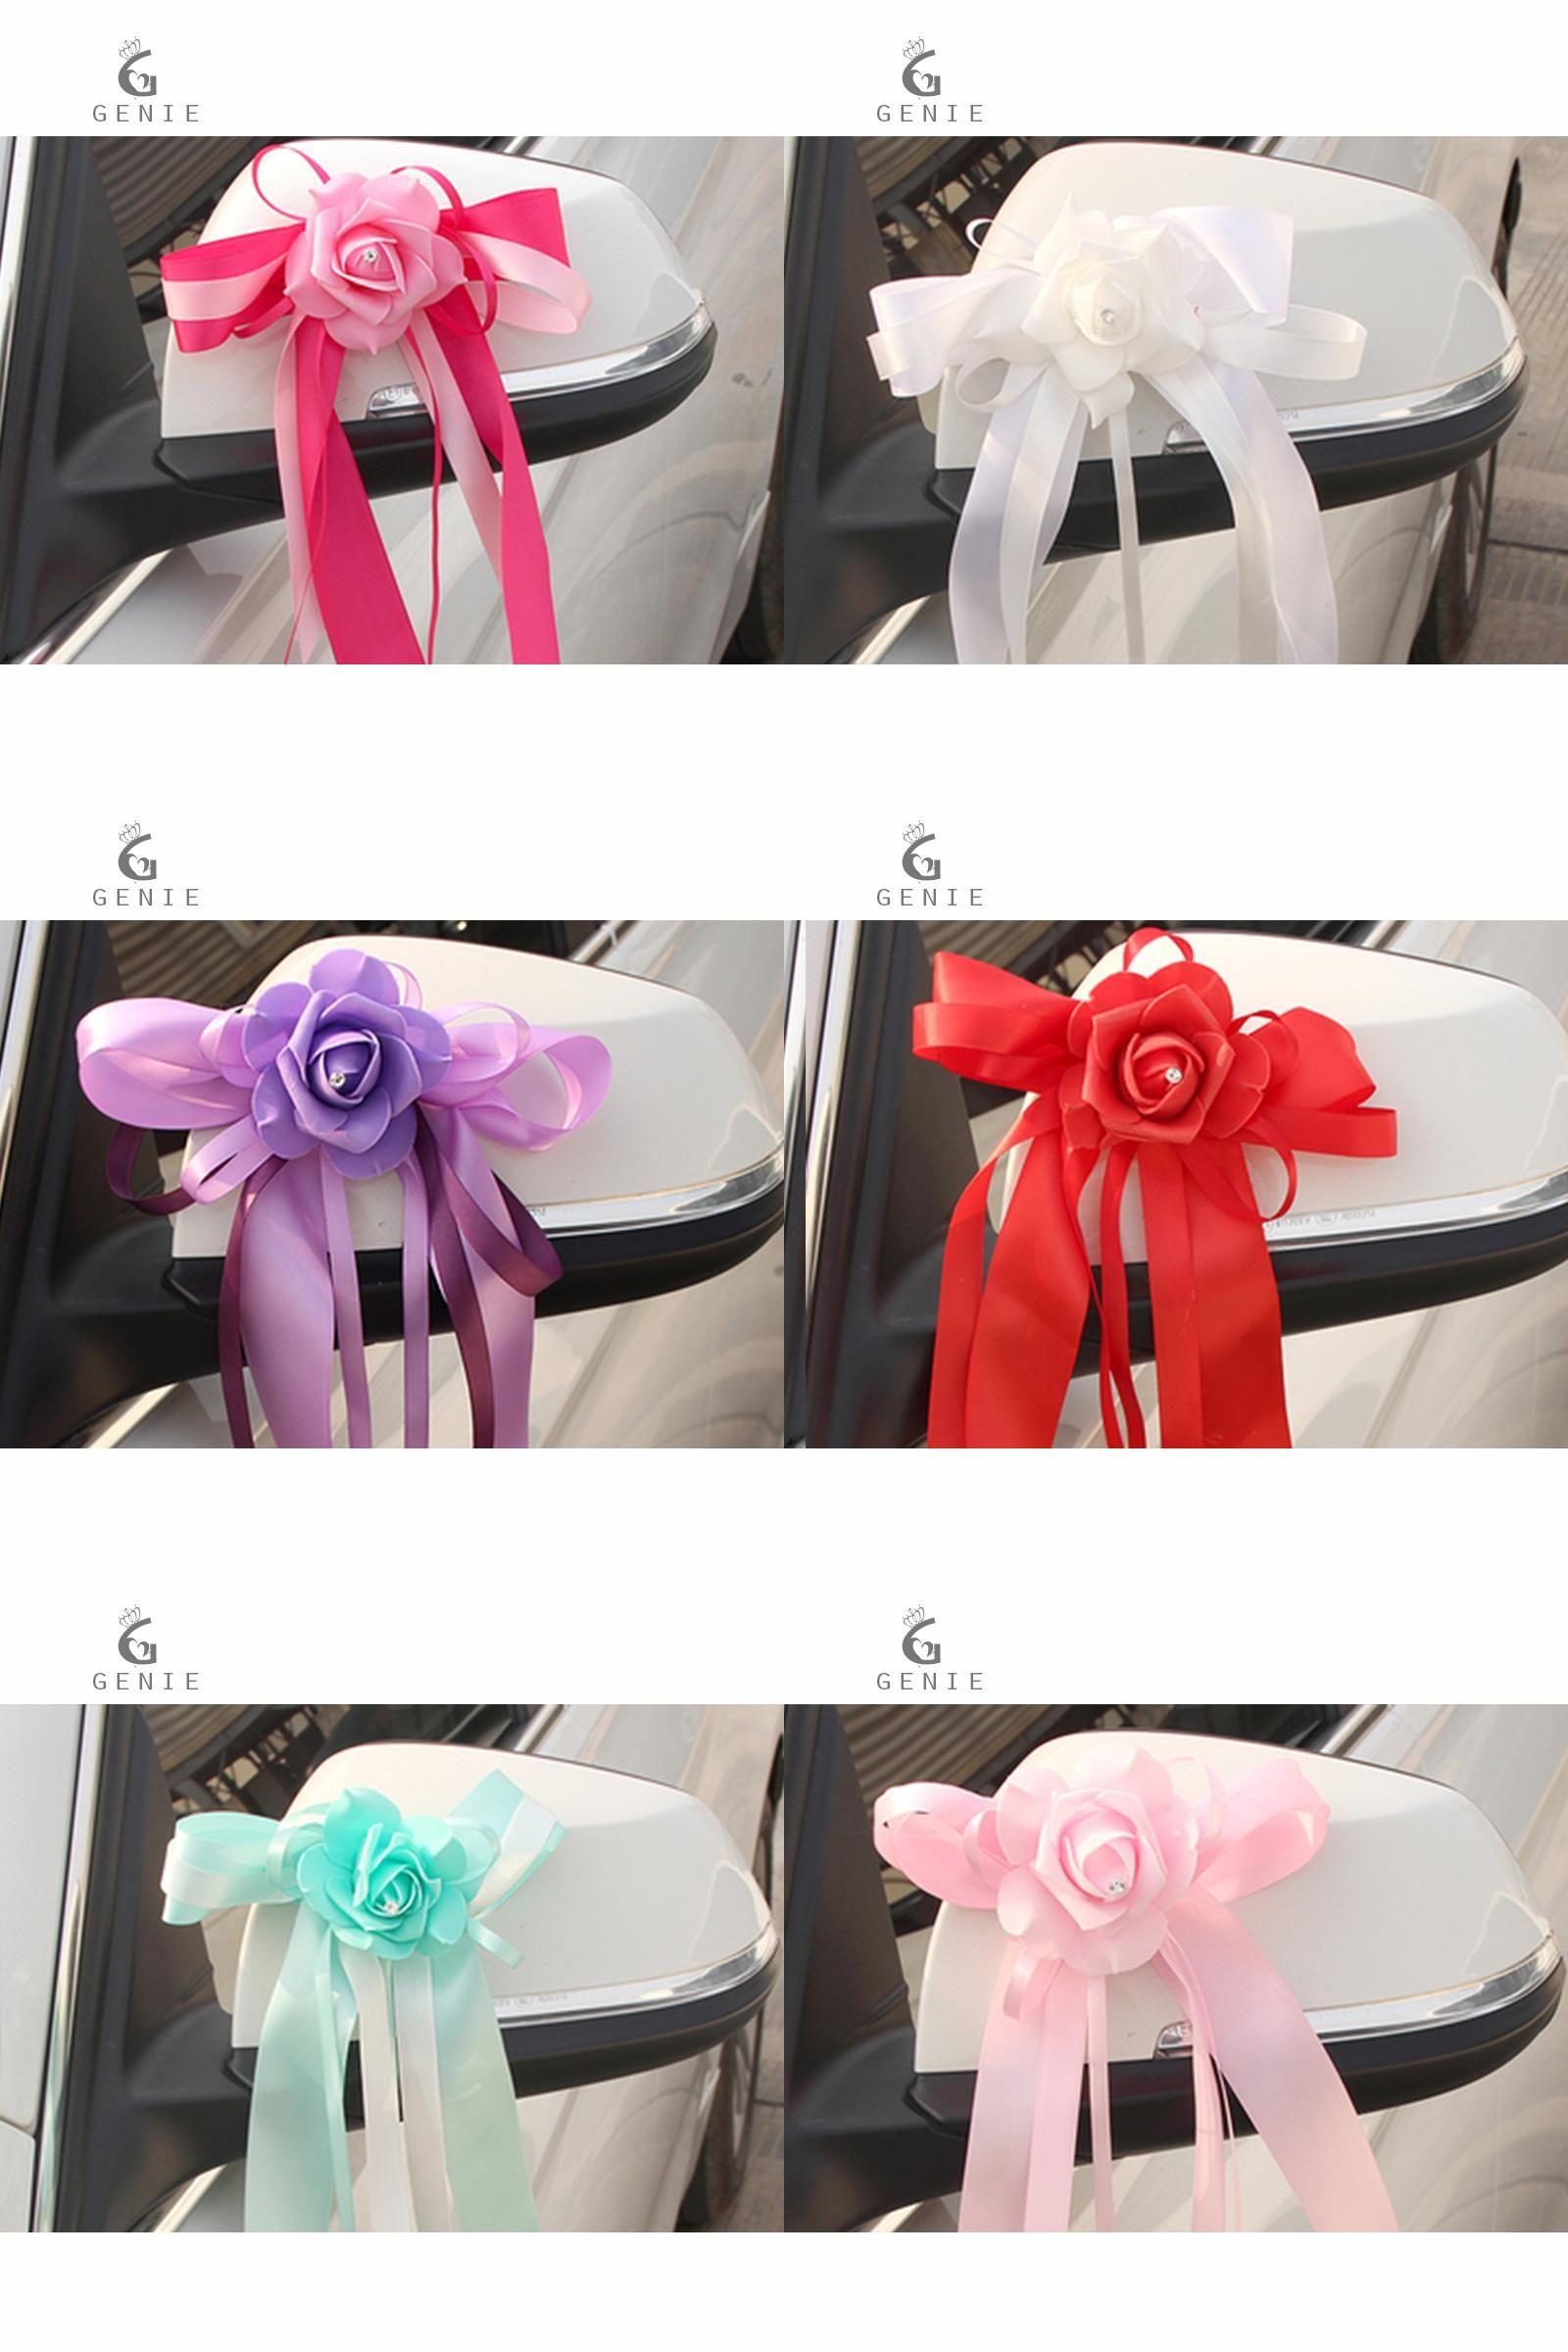 Wedding car flower decoration images  Visit to Buy Genie Wedding Car Decoration Artificial Flower Foam